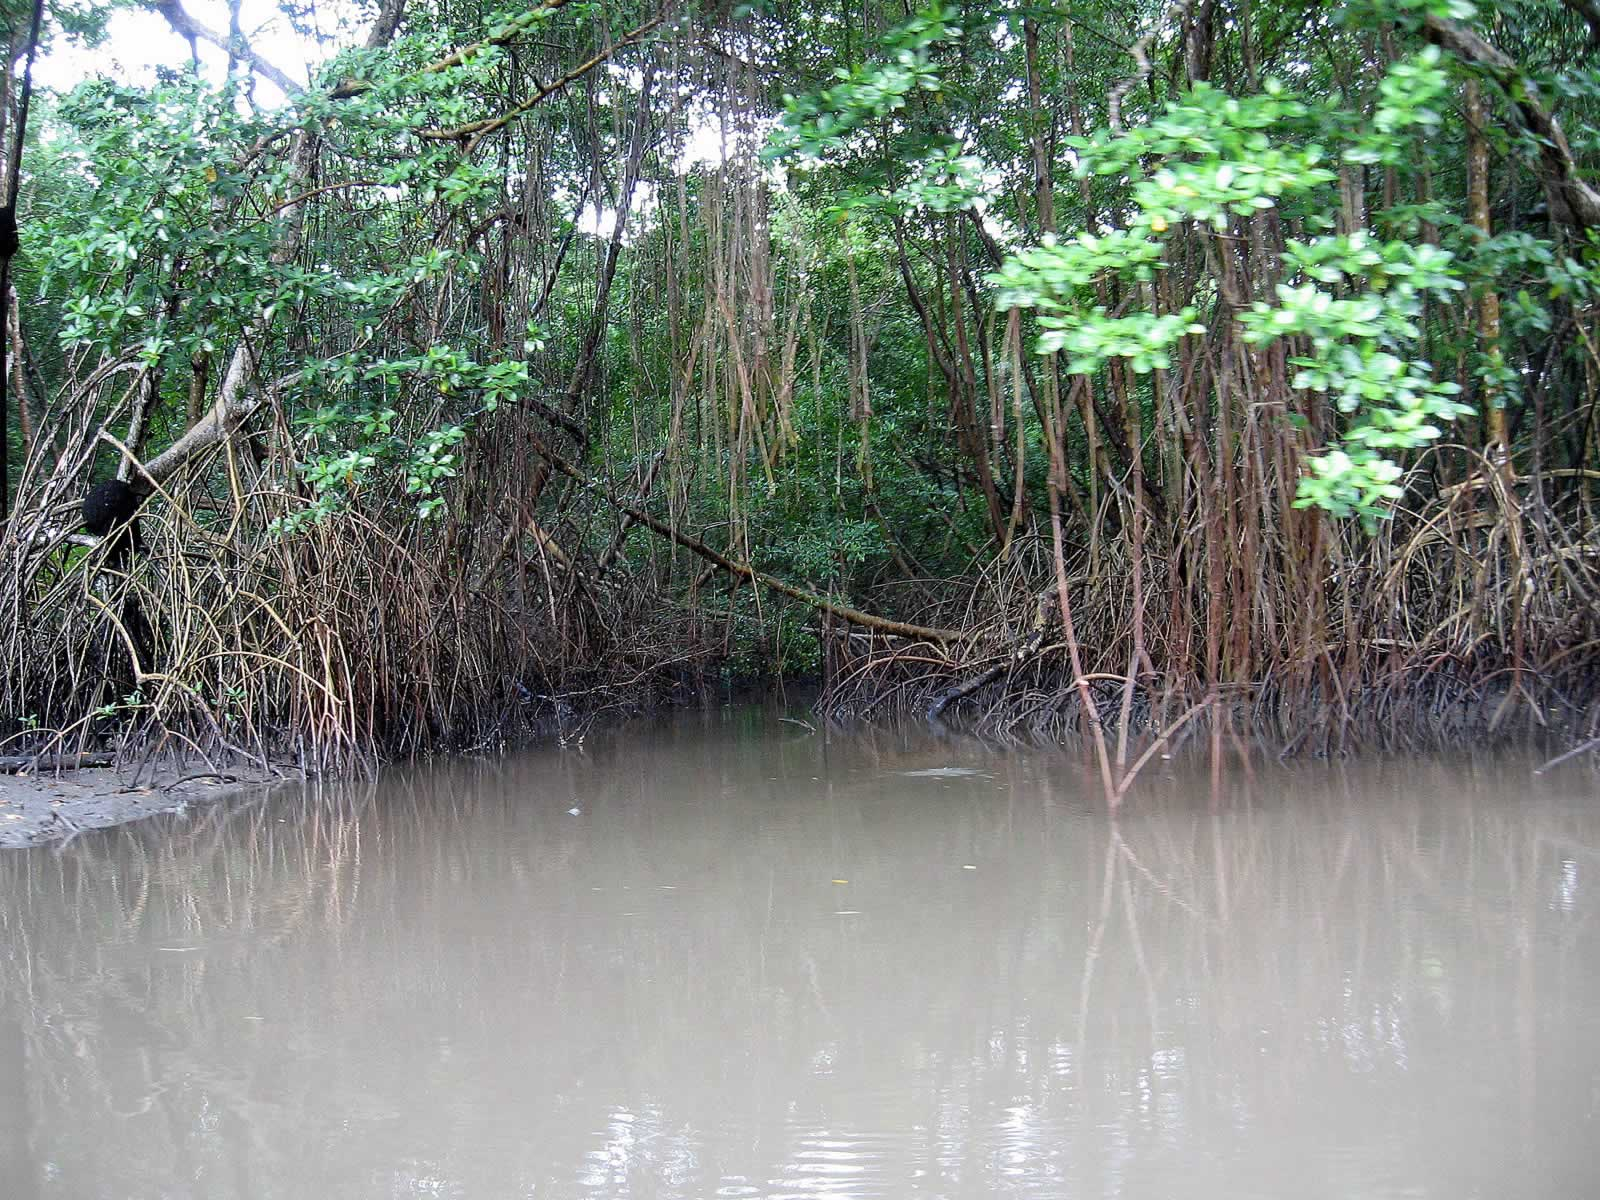 Caroni Swamp And Bird Sanctuary Destination Trinidad And Tobago Tours Holidays Vacations